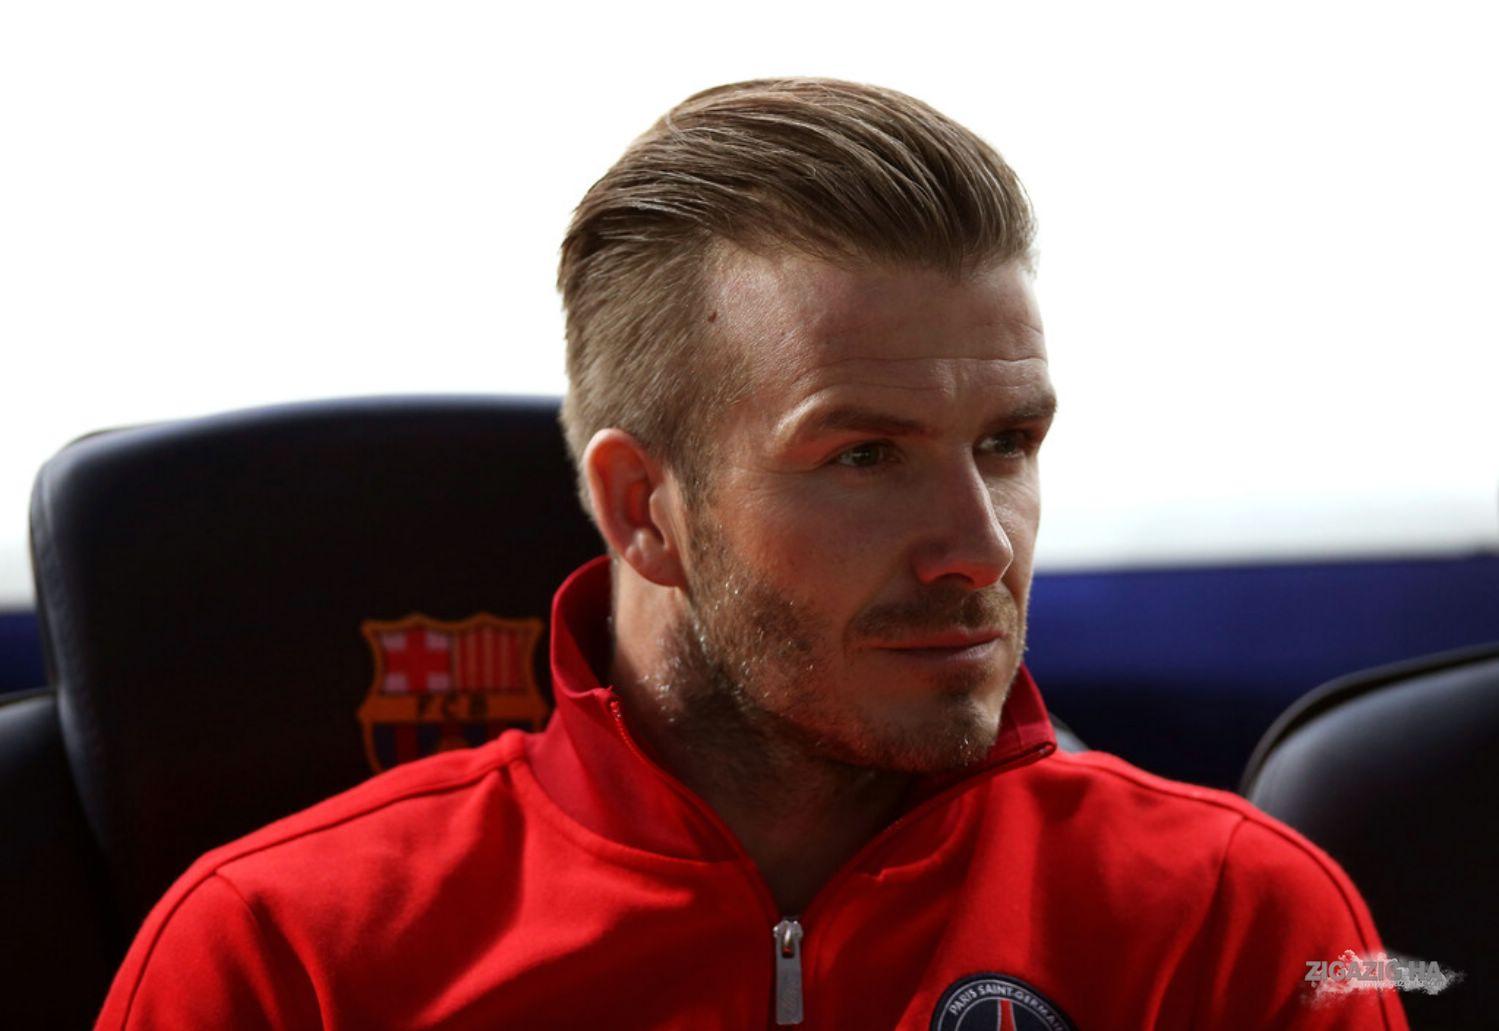 David Beckham Hairstyles 2014 April 9th - Barcelona ...